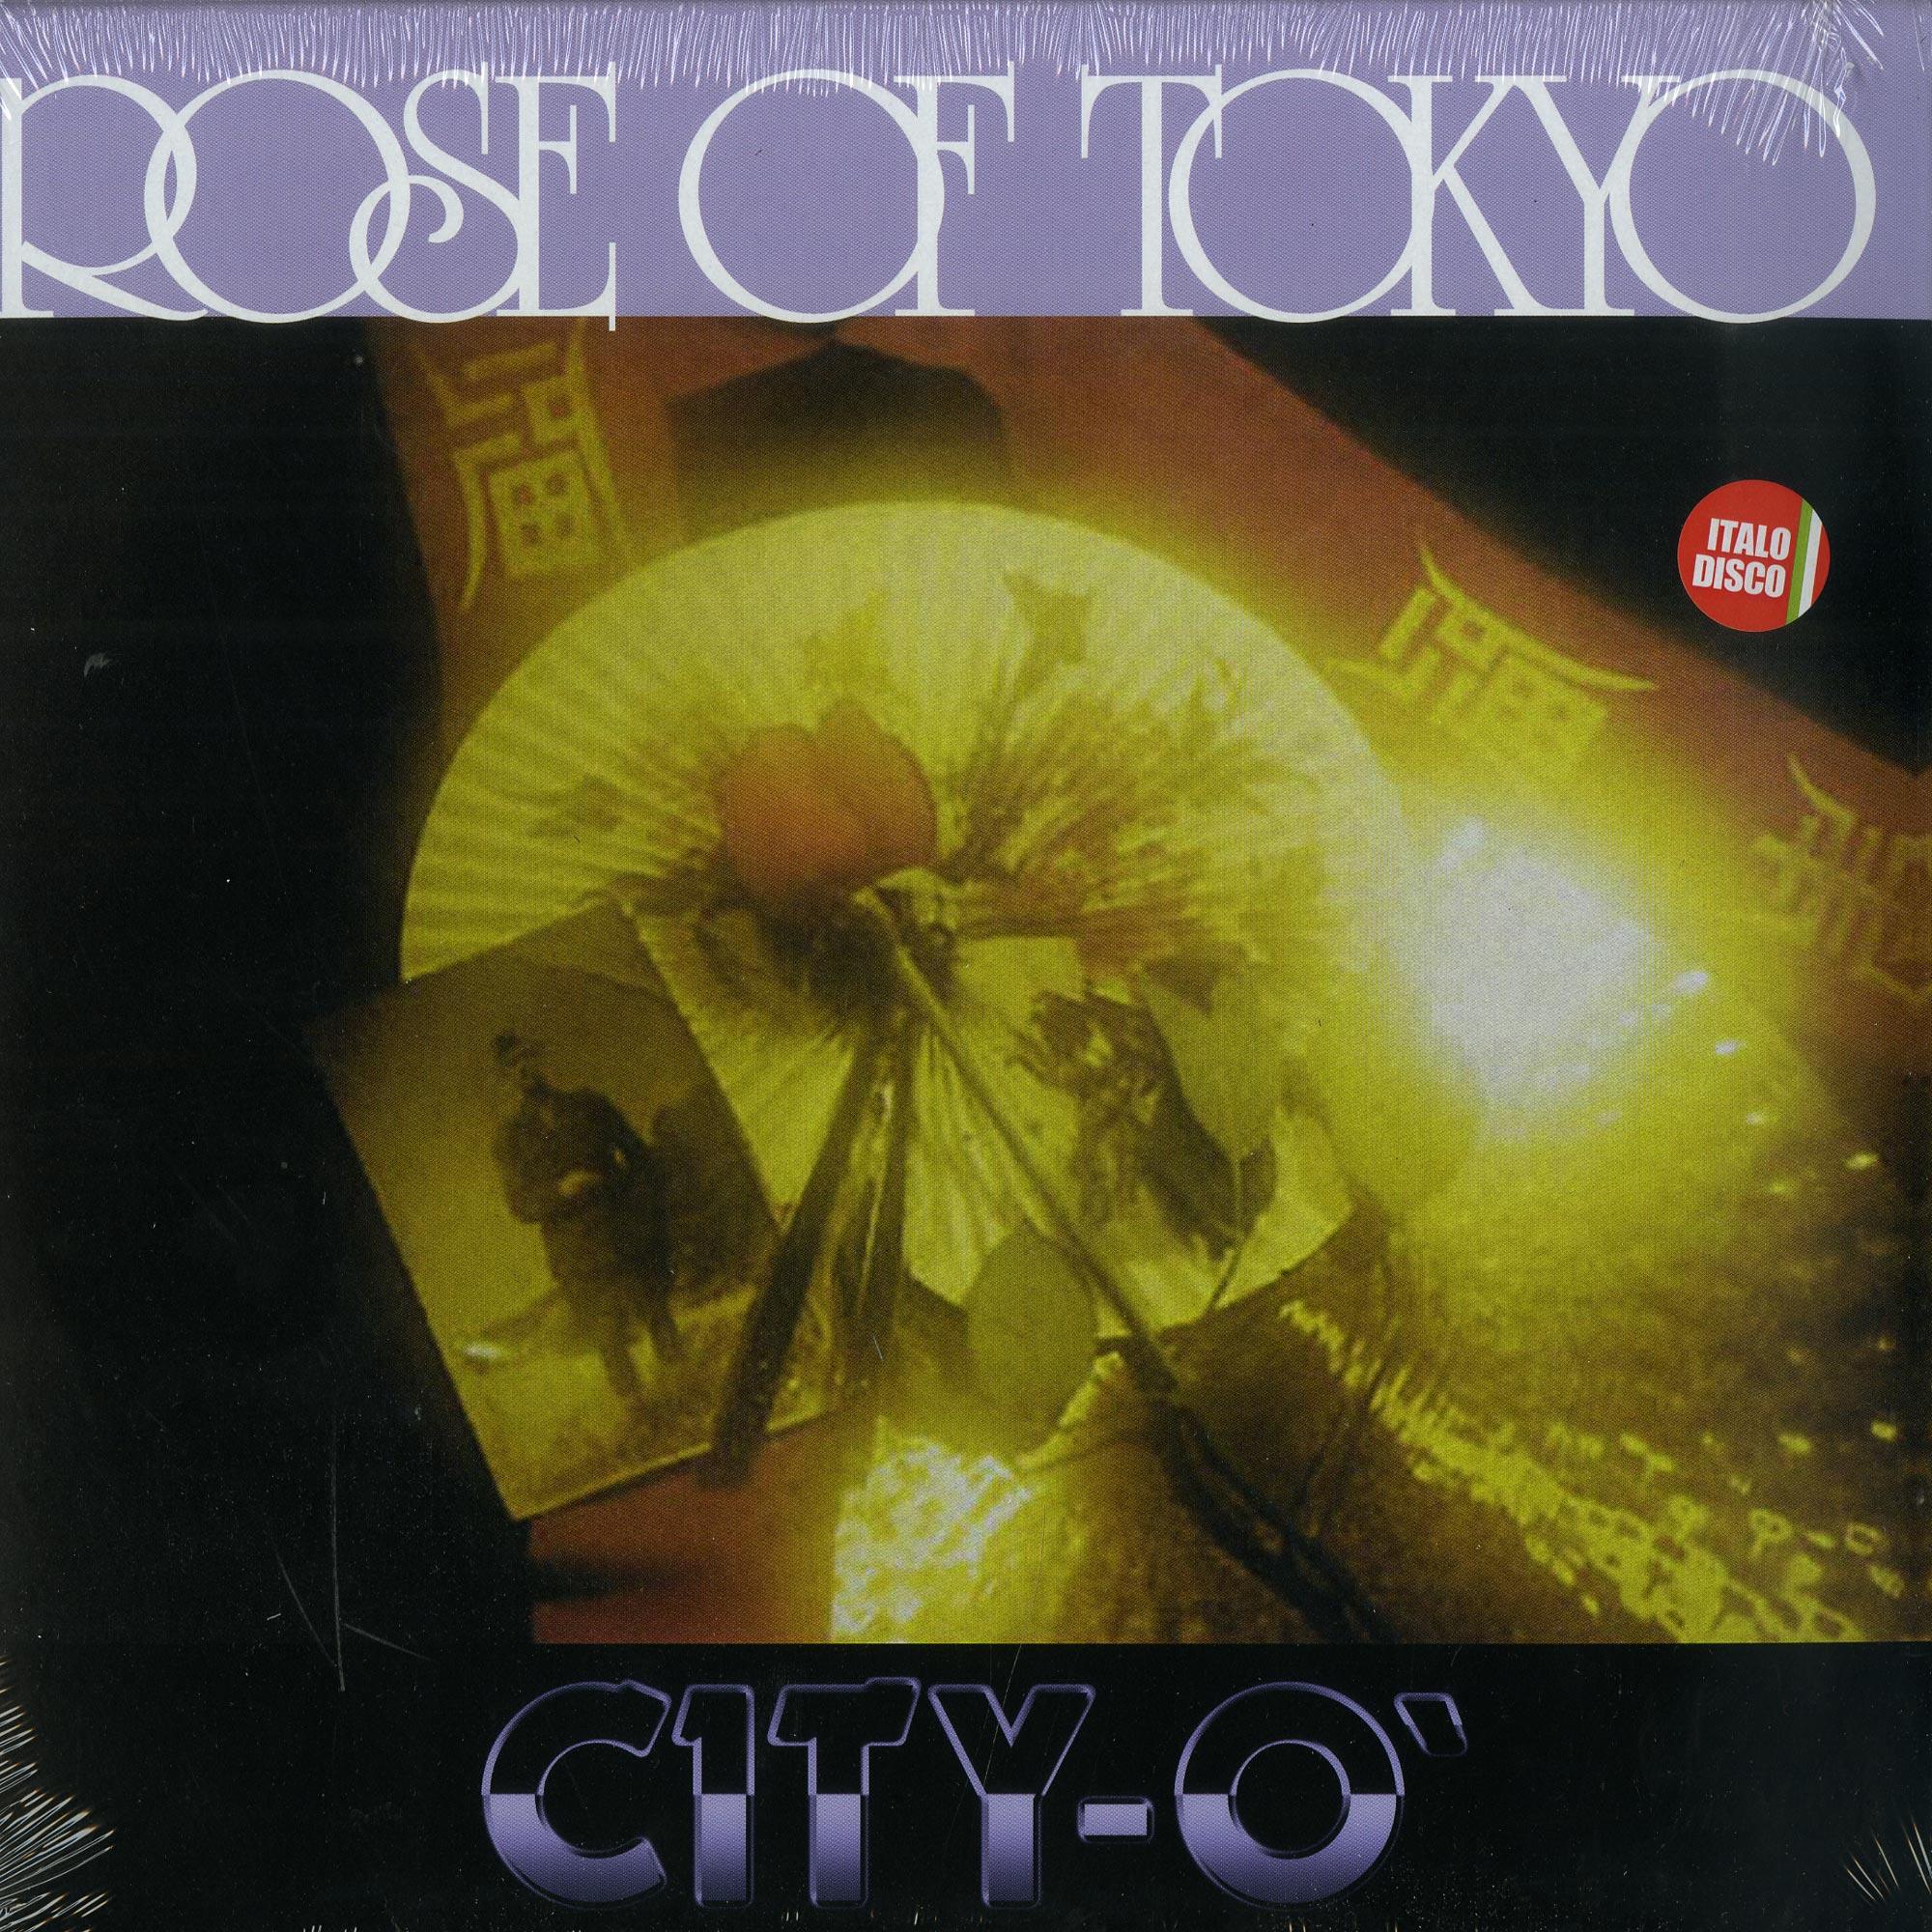 City-O - ROSE OF TOKYO